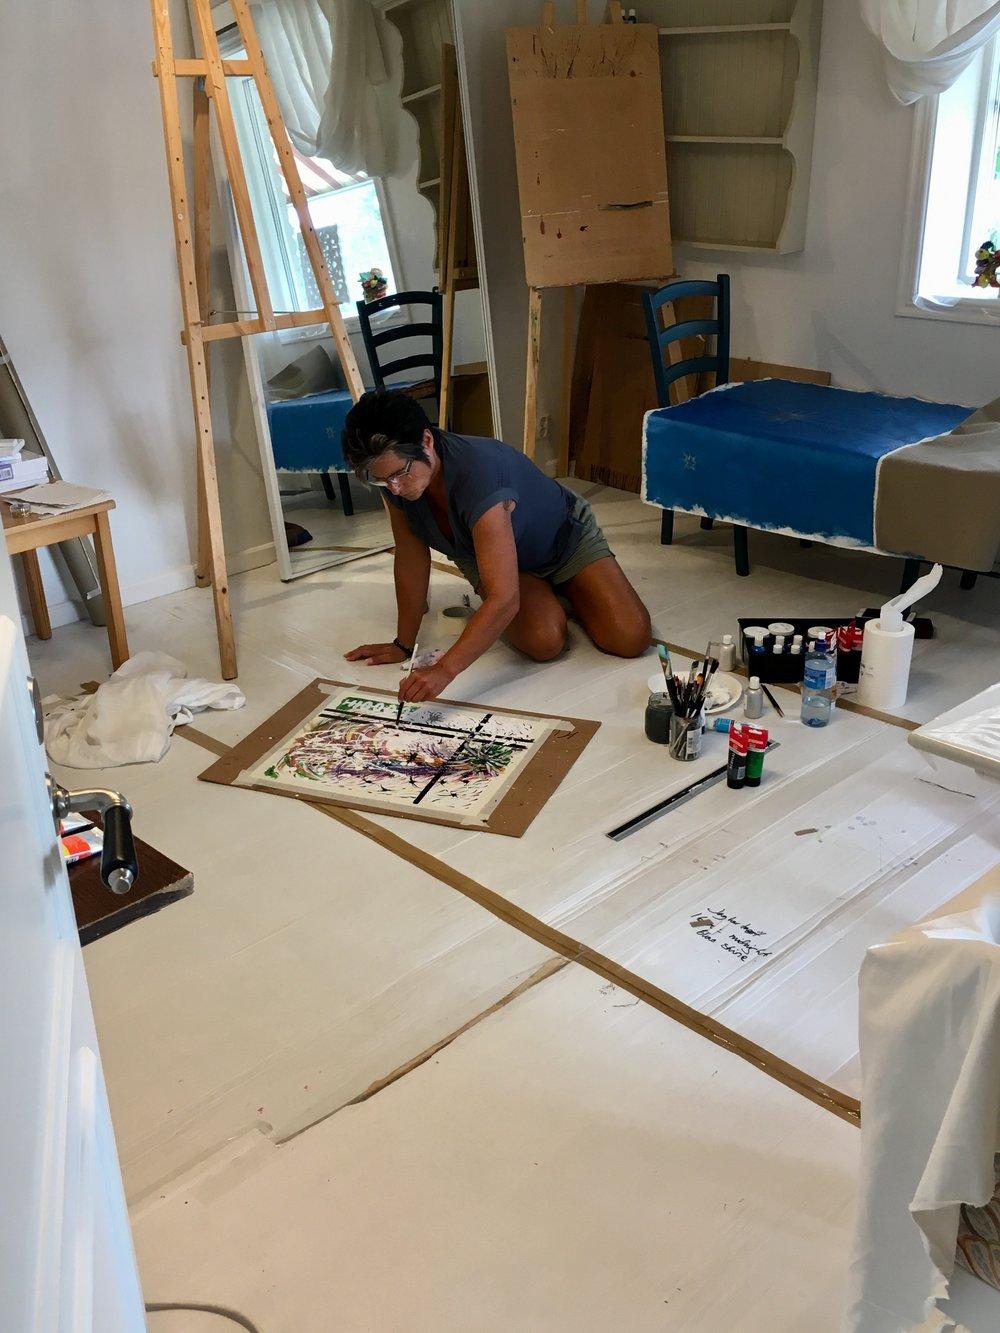 IMG 1024.jpg Ulrika målar inomhus i salongen.jpg b0a353f5cb4fb